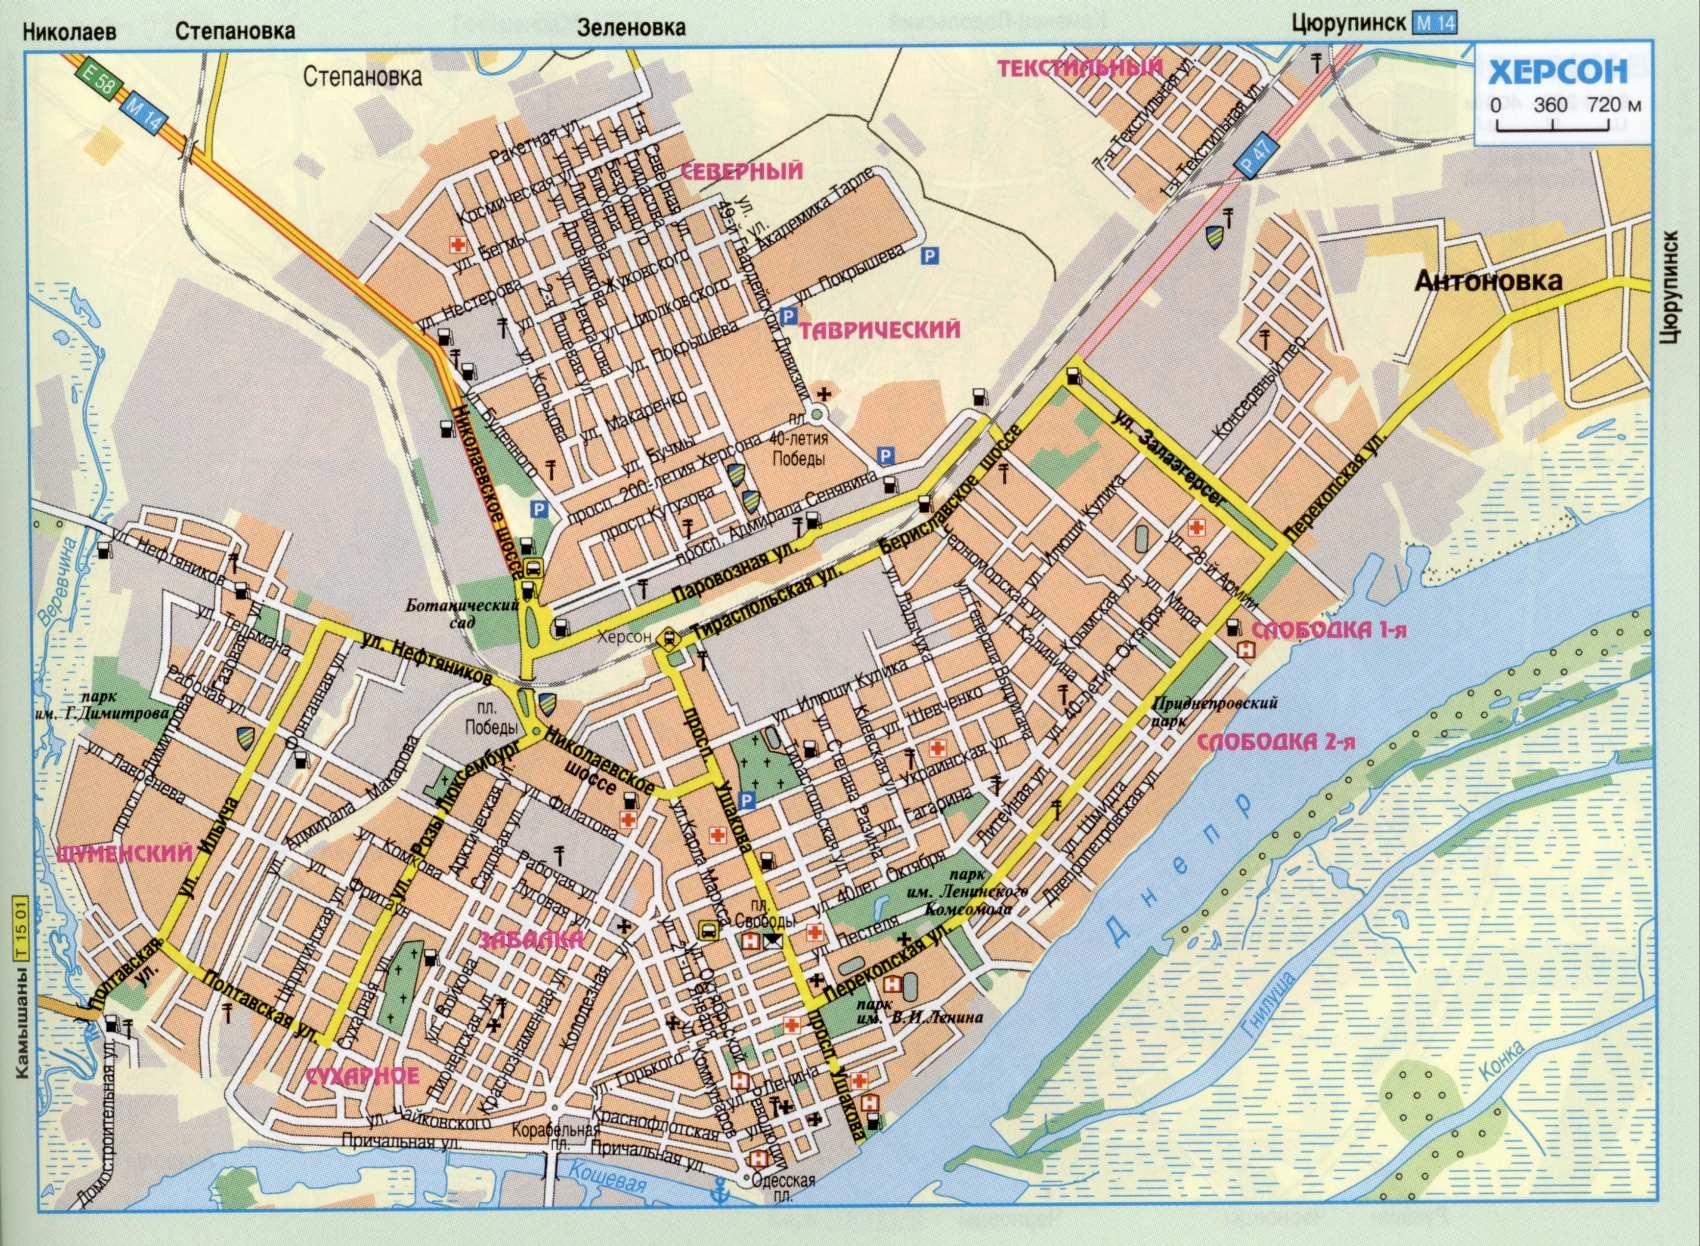 карта Херсона, диваны в Херсоне